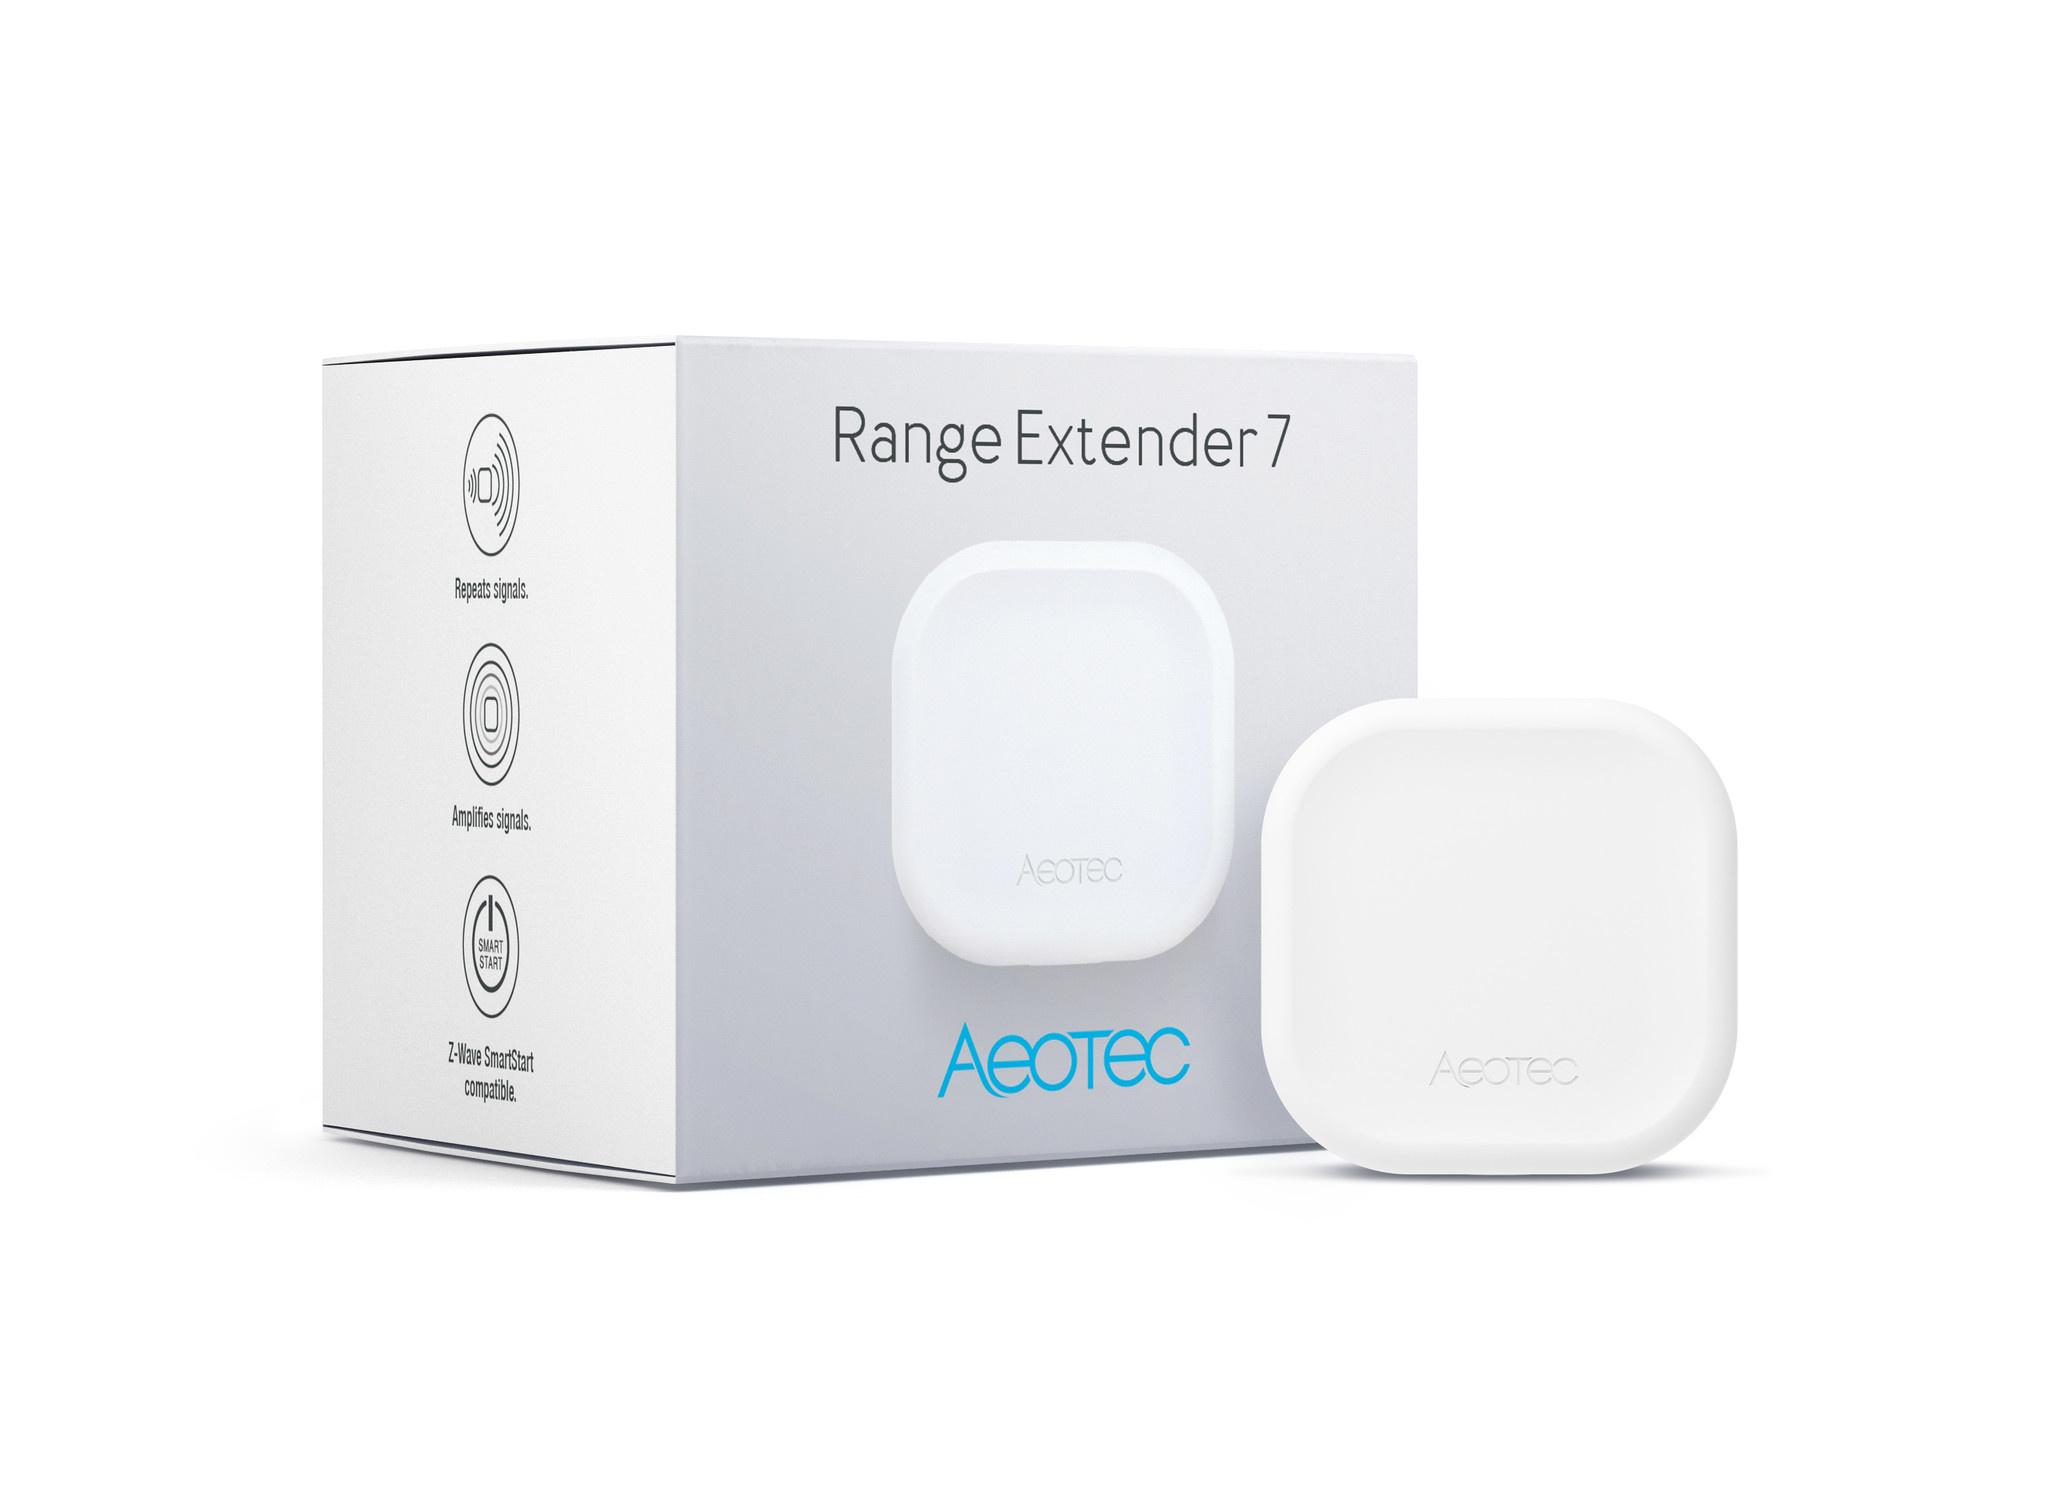 AEOTEC AEOTEC Range Extender 7 Z-wave Plus GEN7